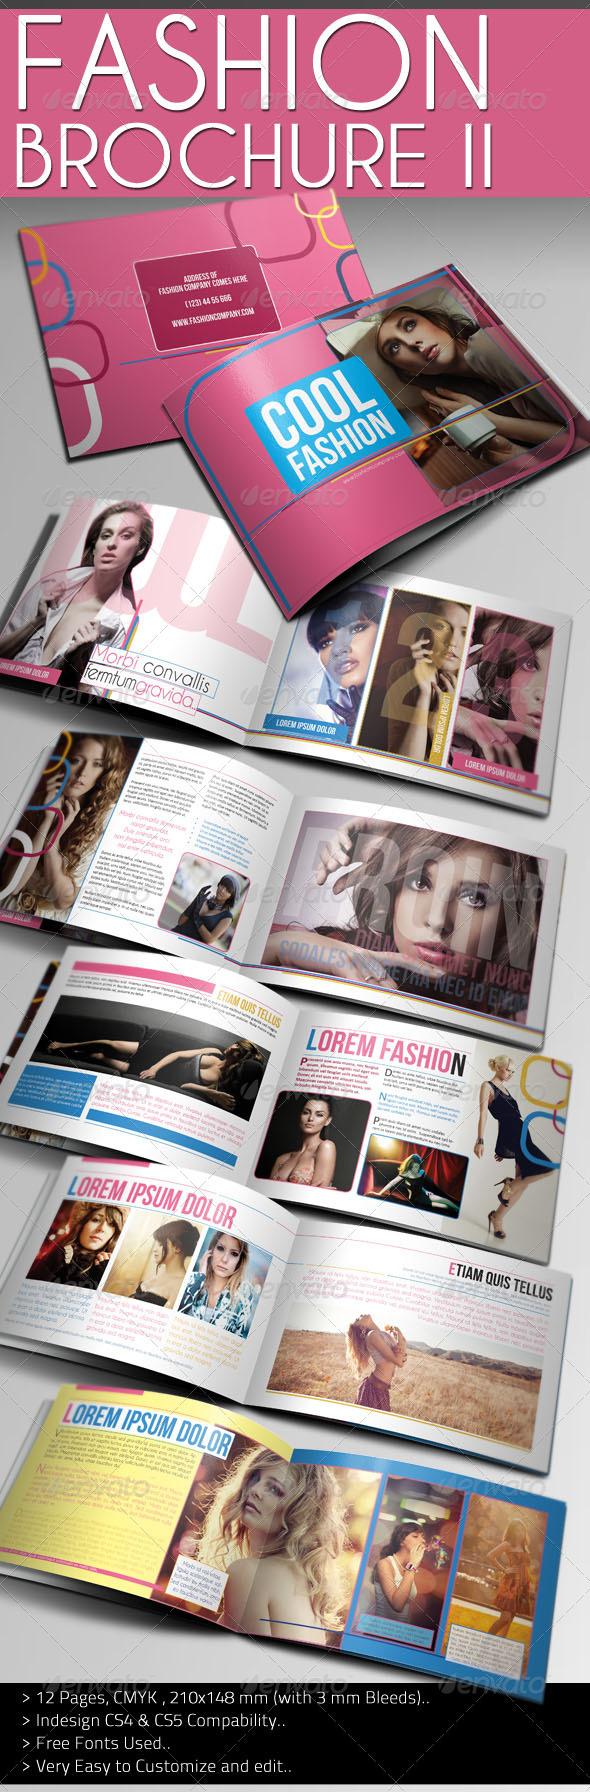 Cool fashion brochure graphicriver for Fashion brochure templates